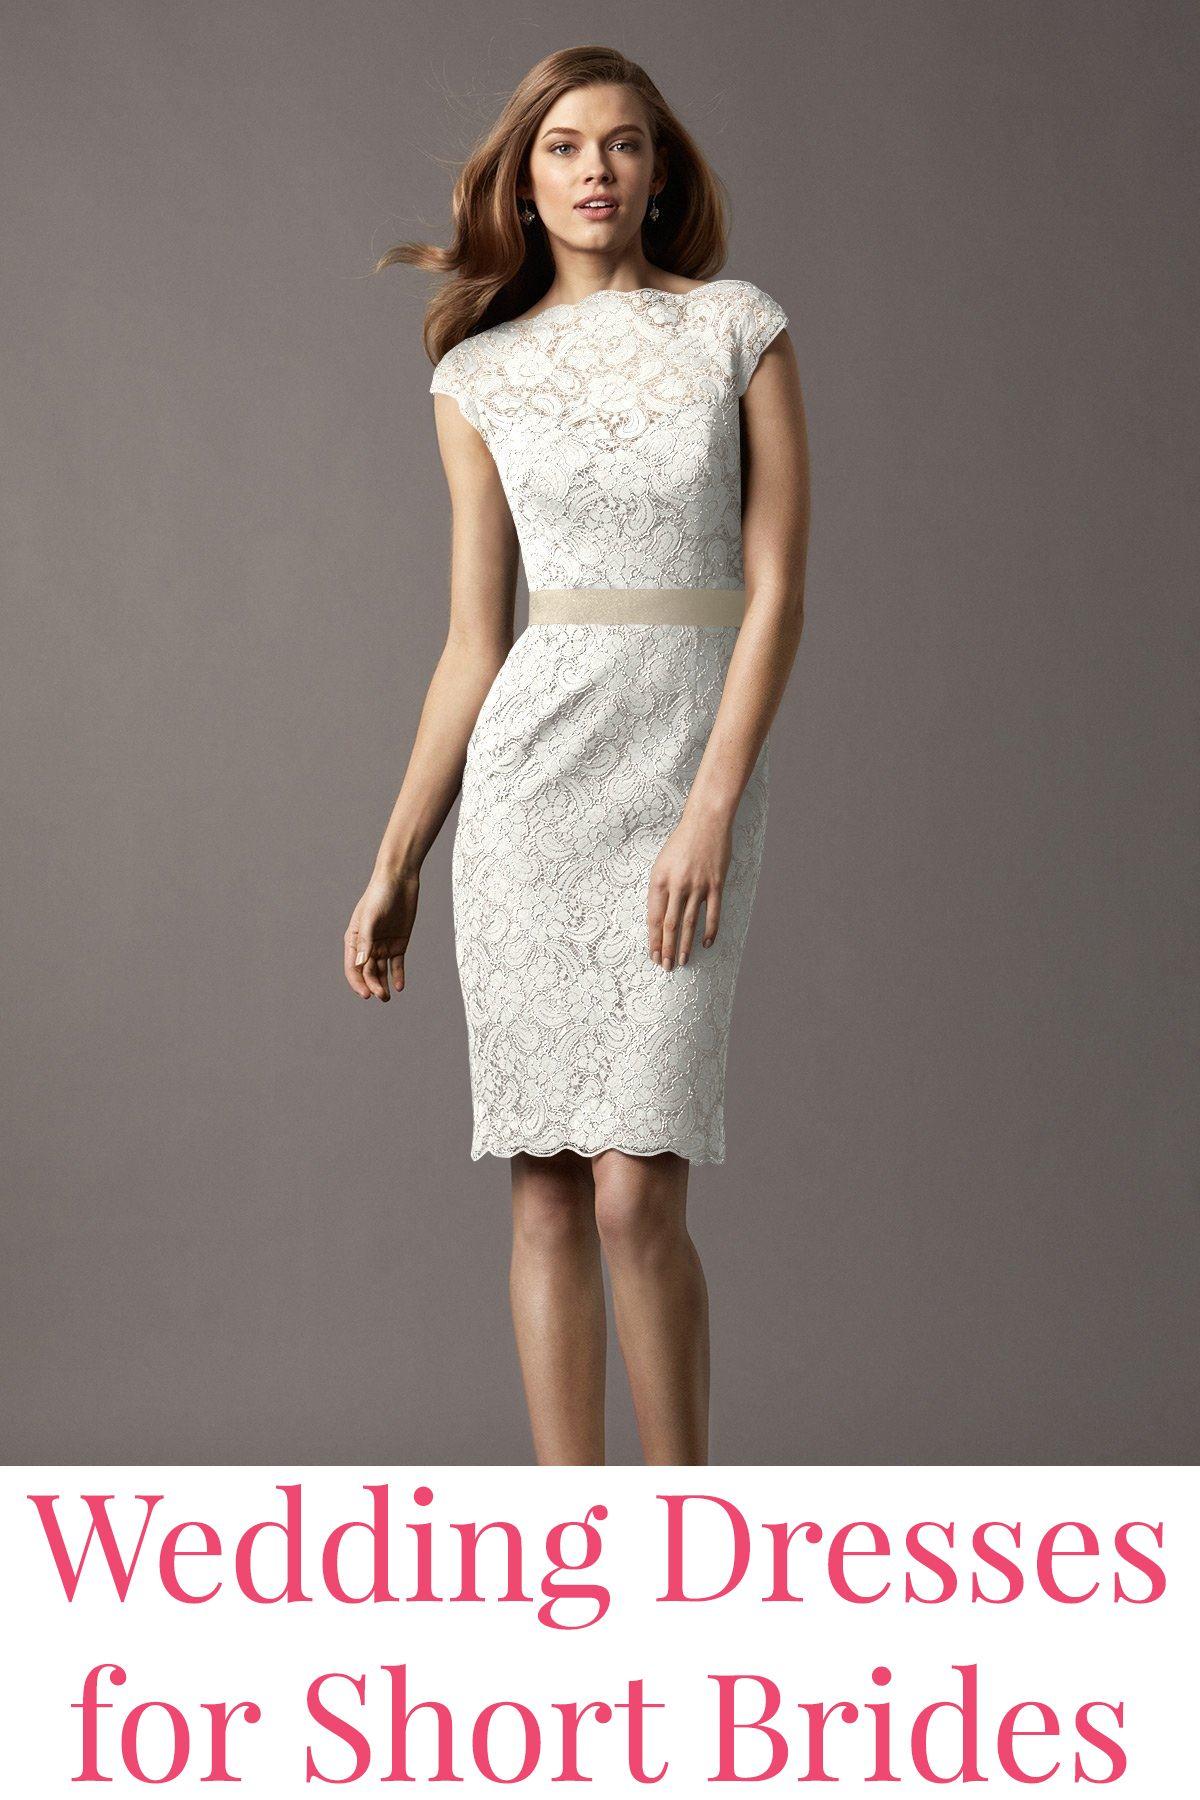 Wedding dresses for short brides short bride gowns and wedding shoppe